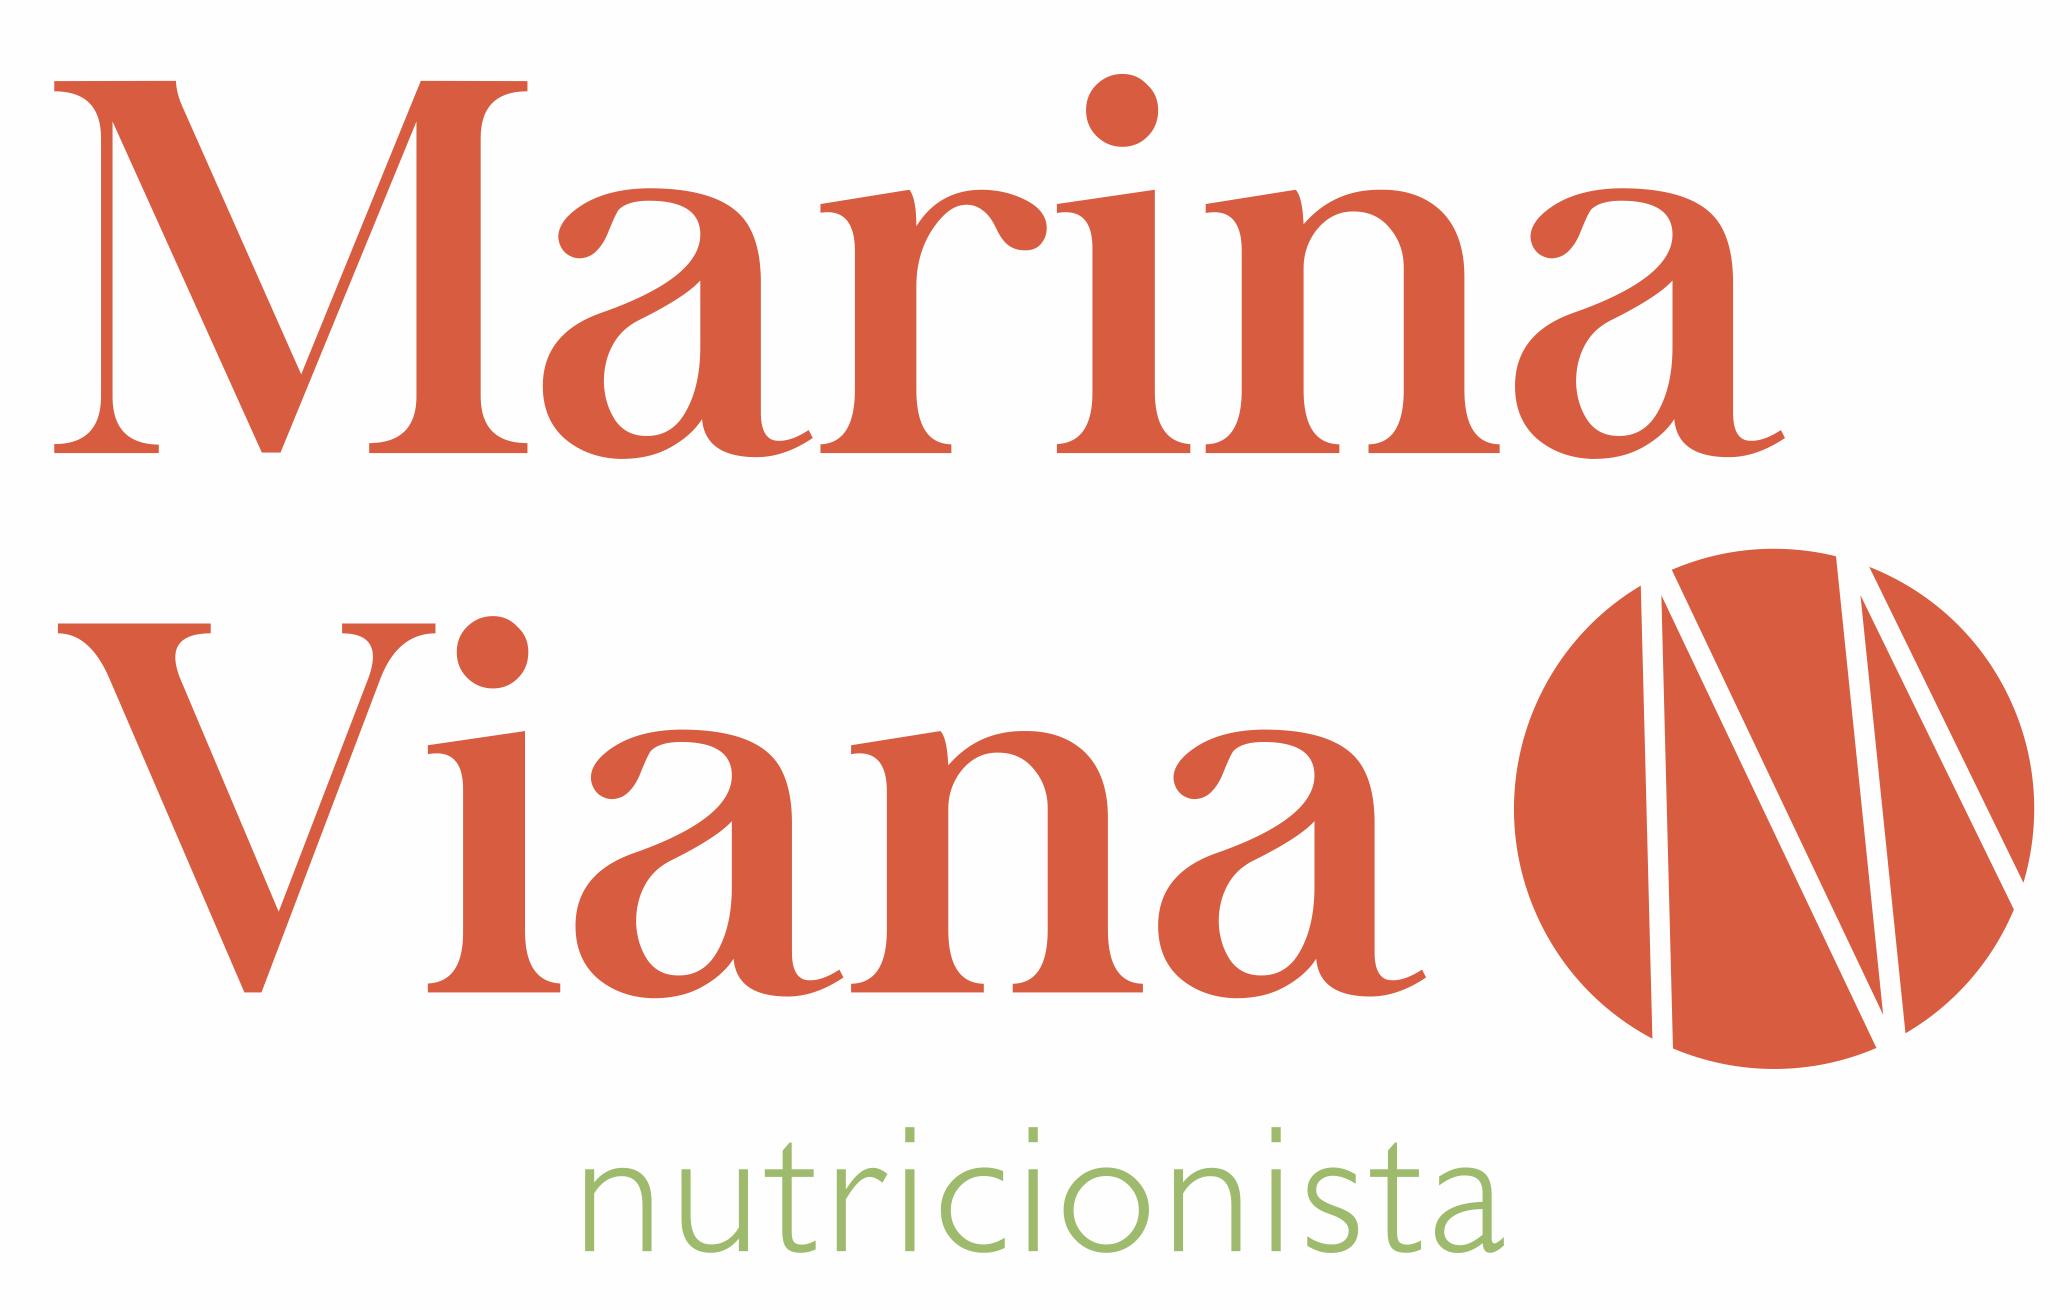 Marina Viana Nutricionista – Belo Horizonte